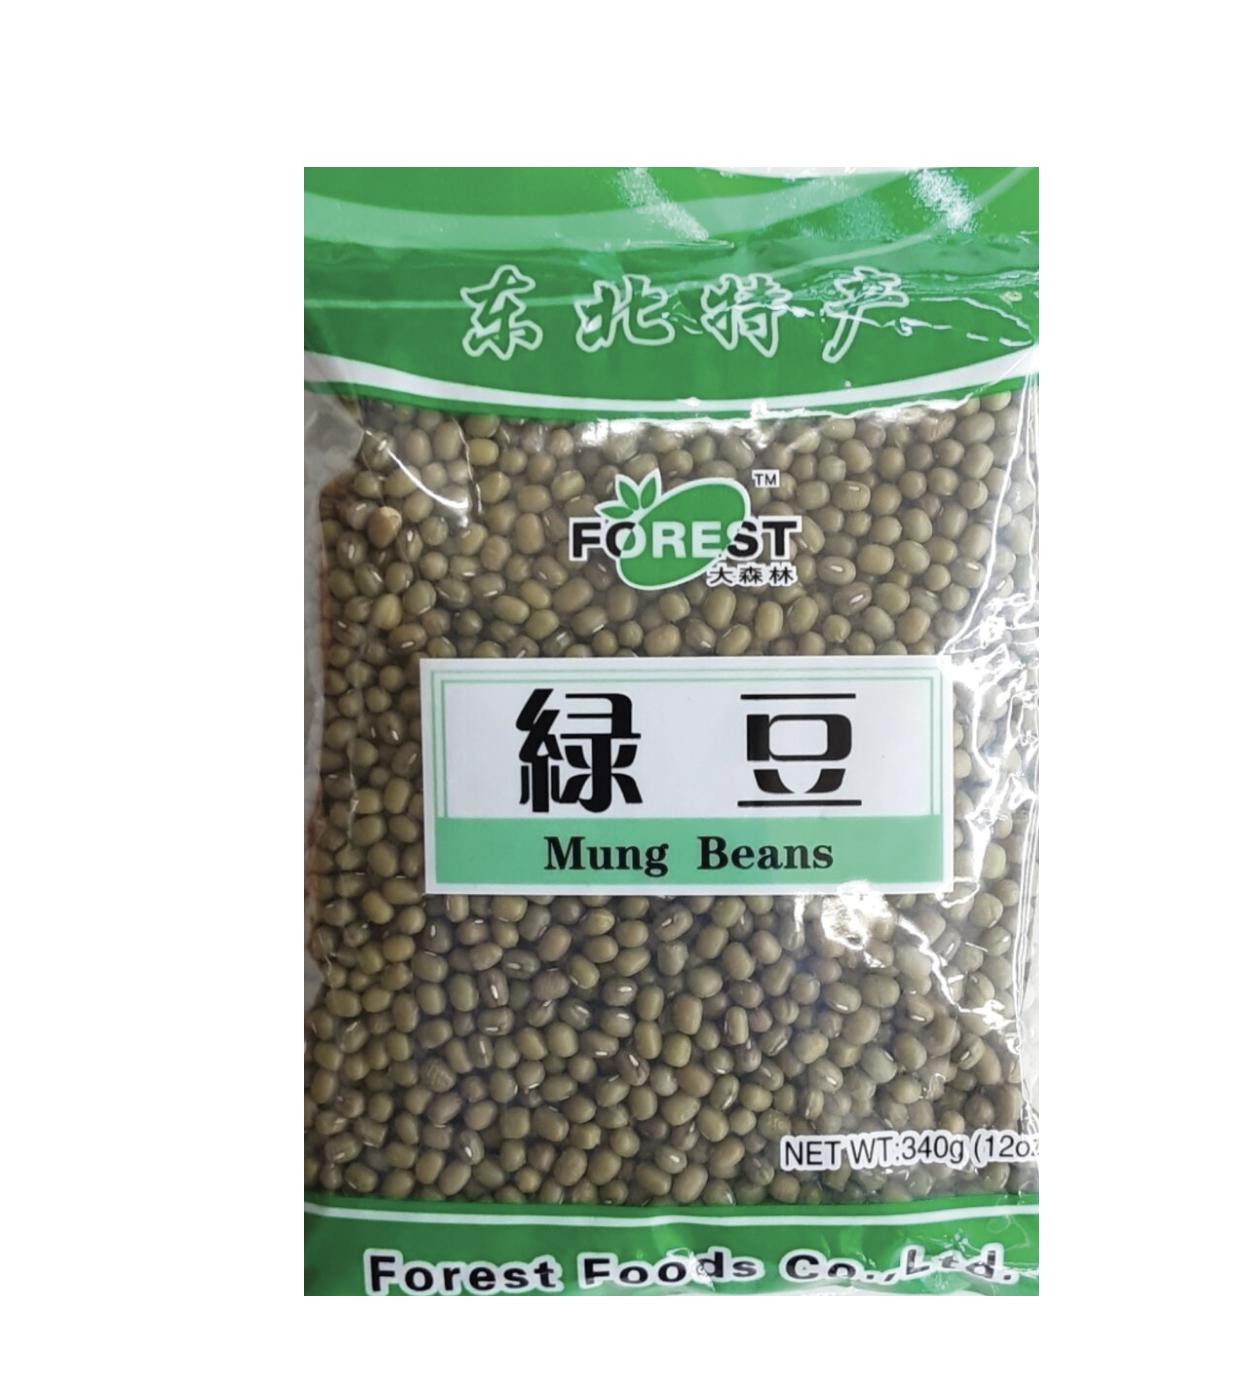 GROC【杂货】大森林 绿豆